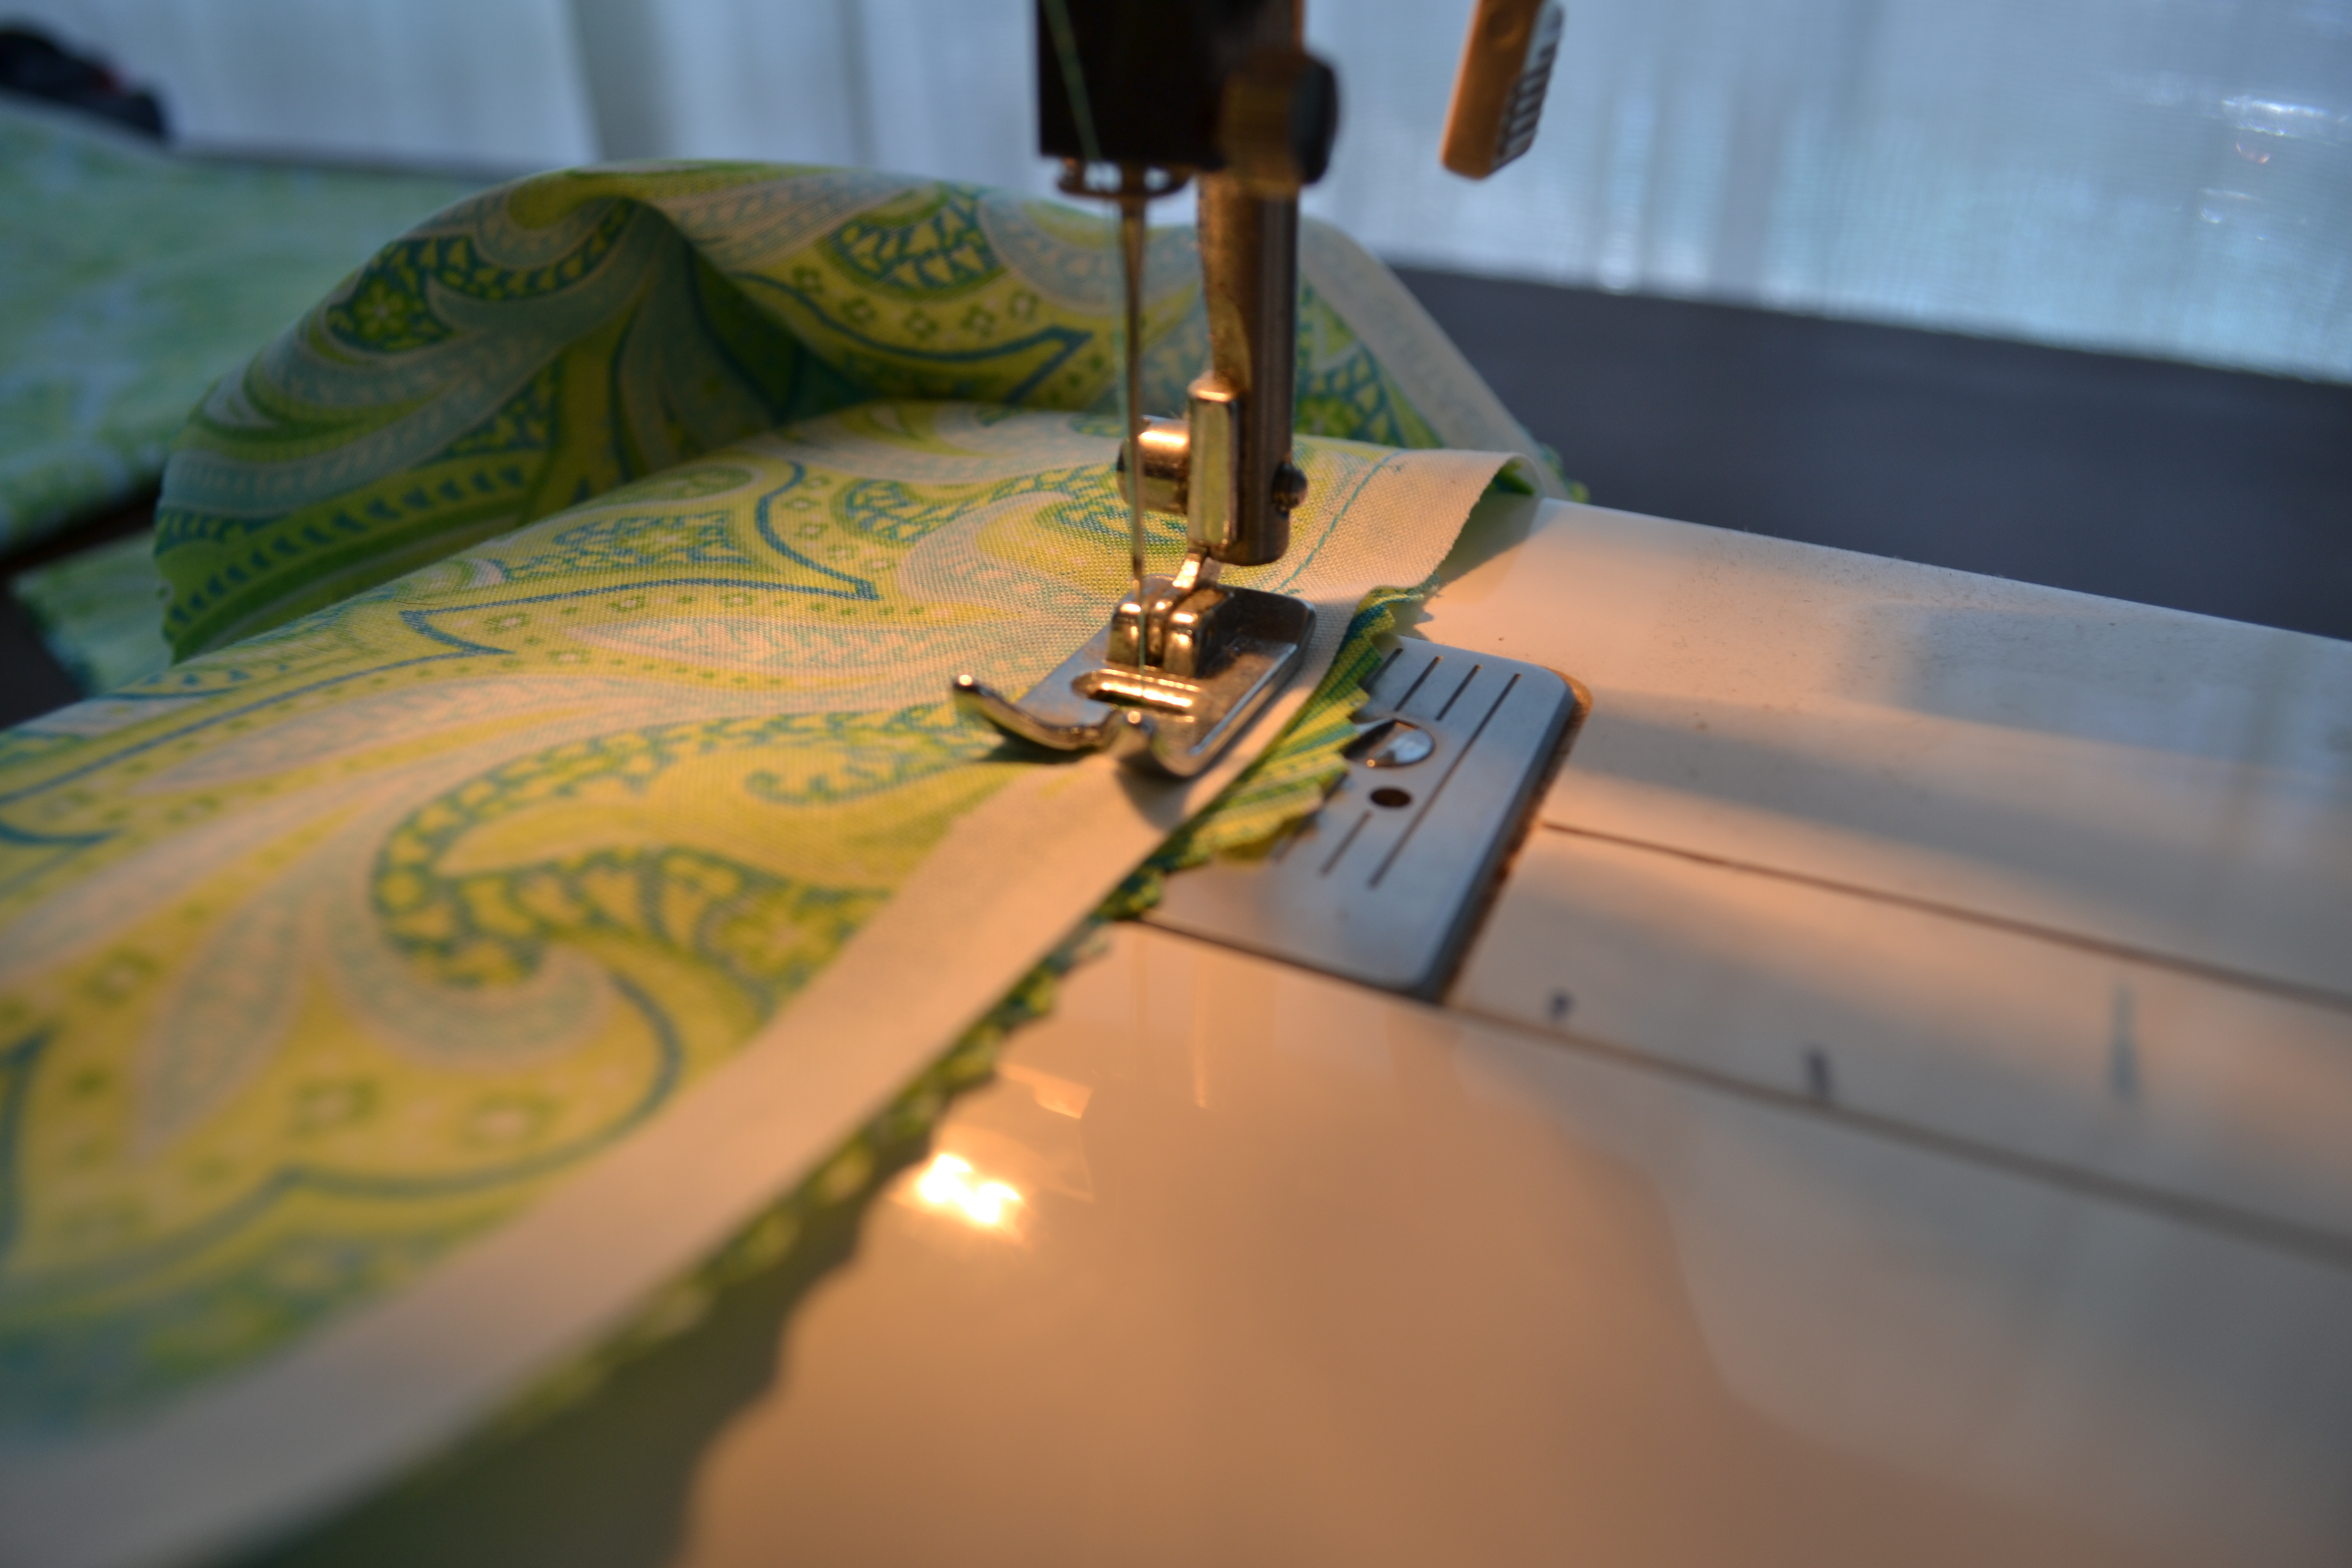 DIY Fabric Table Runner | Handmade Fabric Table Runner | Table Runner Ideas  | DIY No